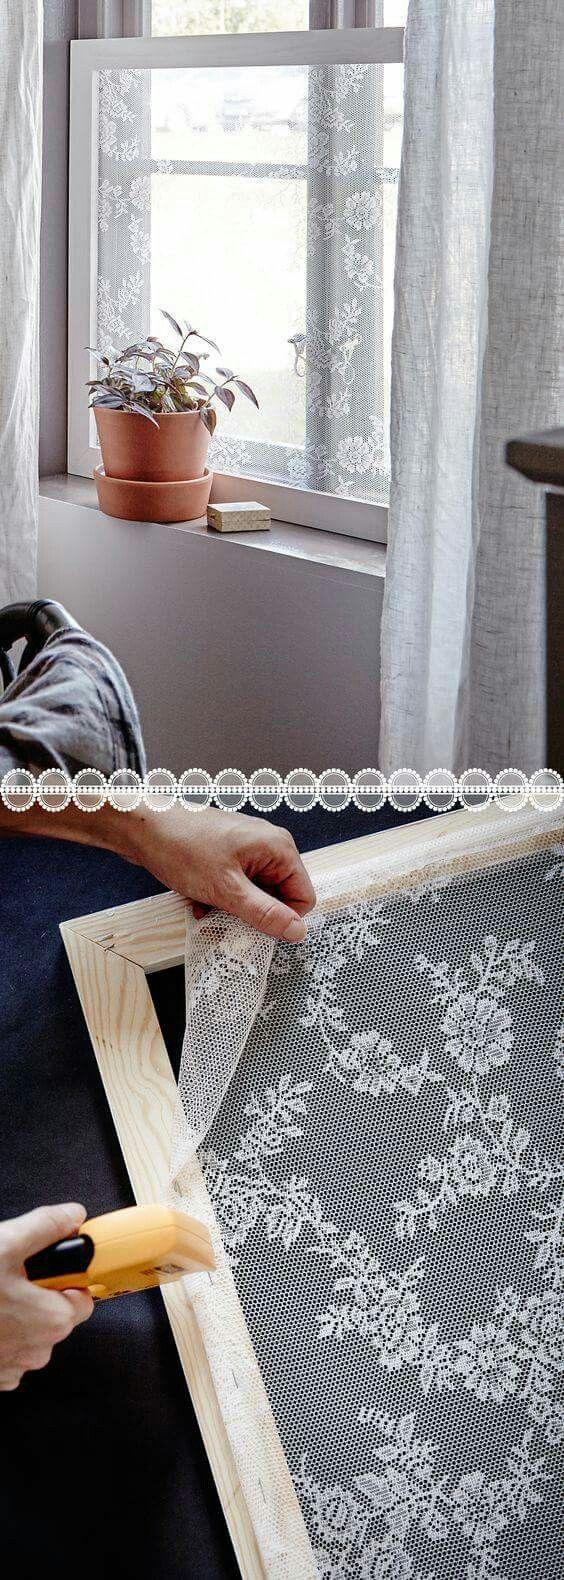 Window decor diy  crafty diy window screens made from lace  home  curtainswindow